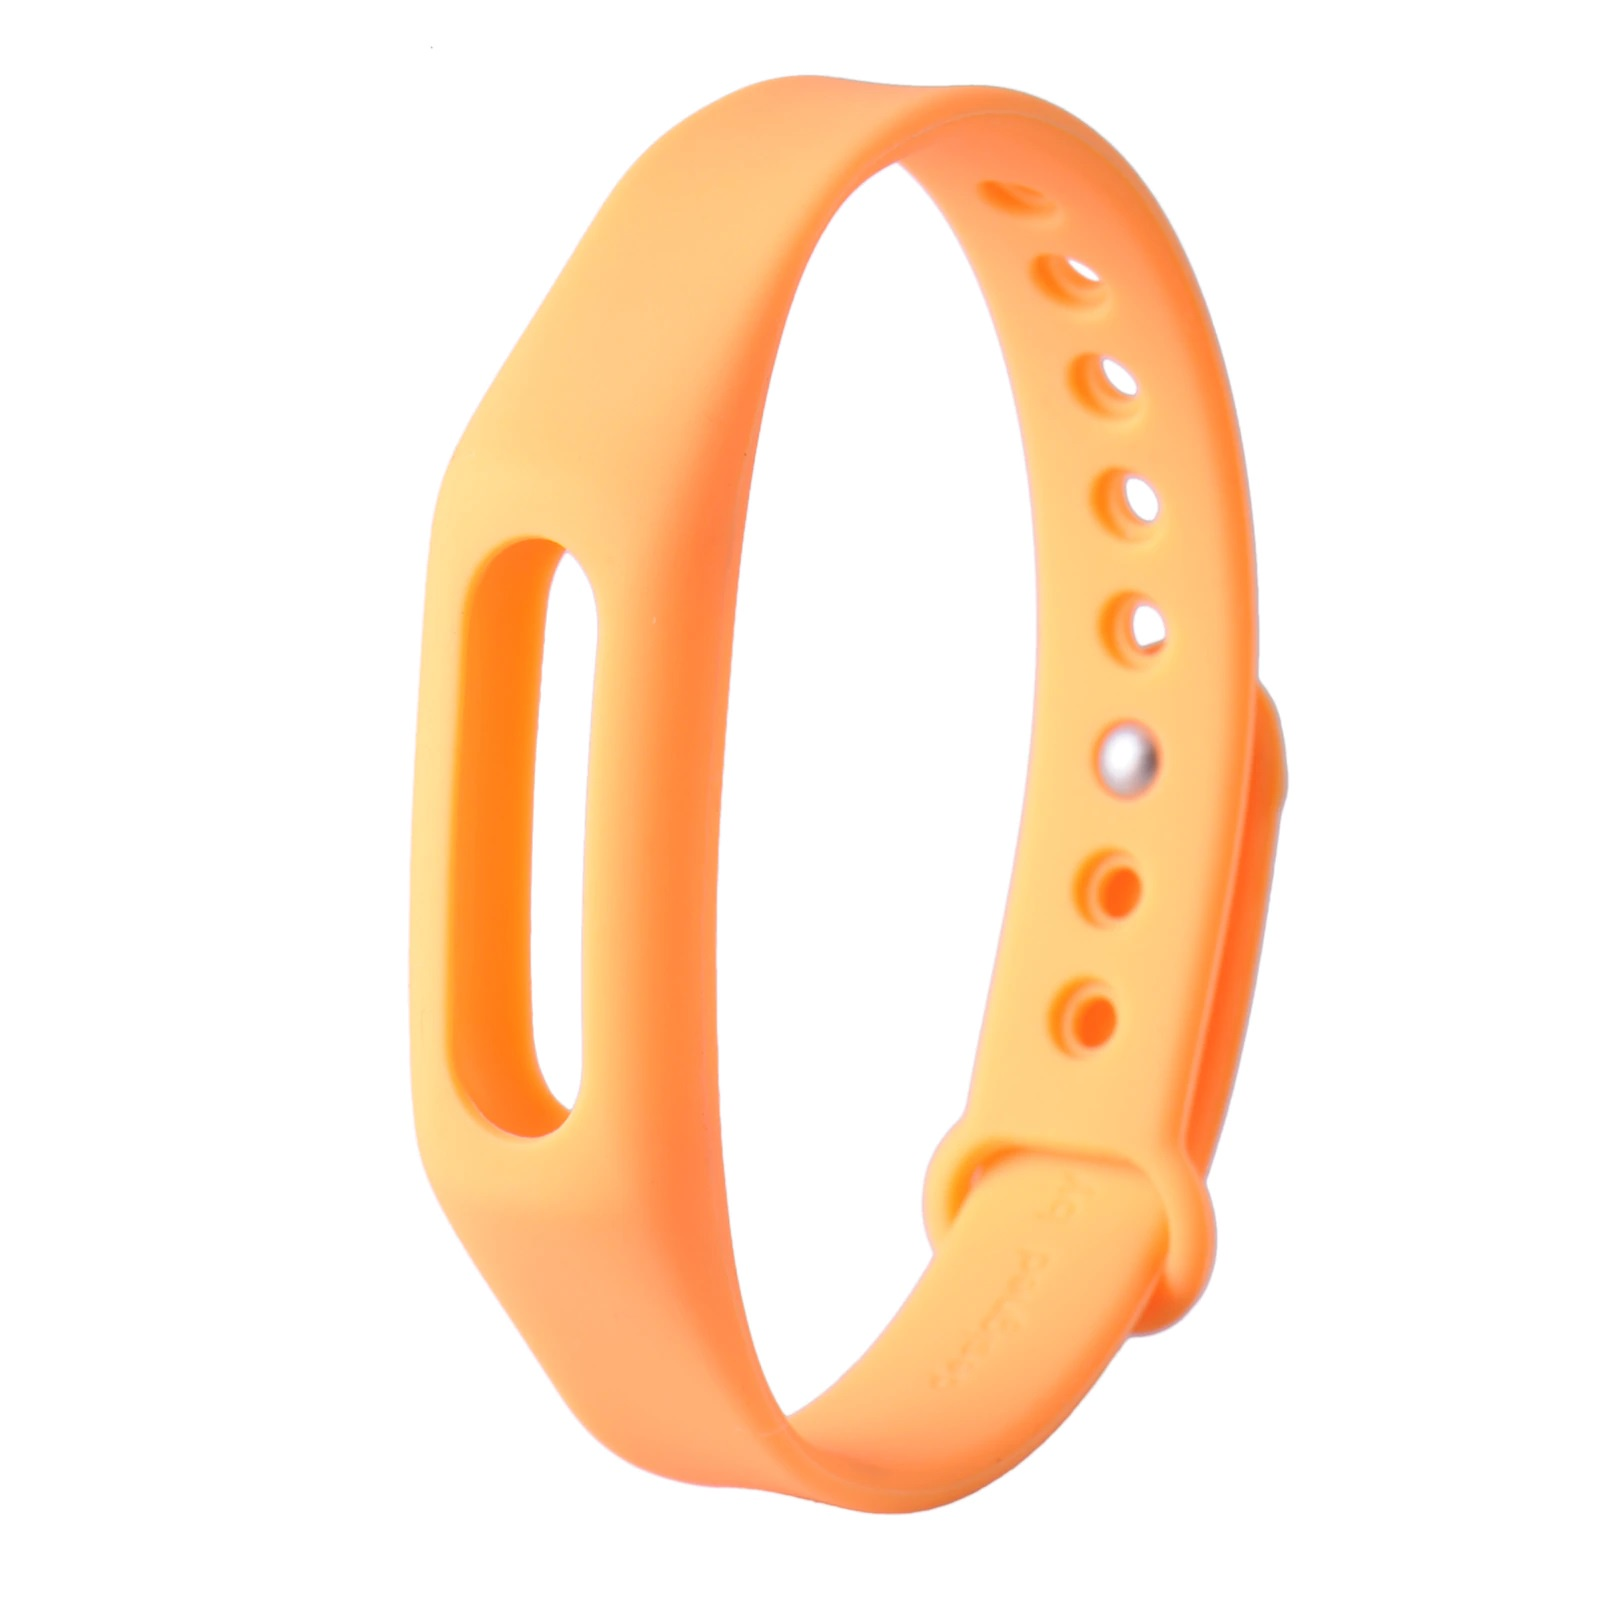 Ремешок для фитнес-браслета для Xiaomi Mi Band 1 Mi Band 1S, оранжевый цена и фото